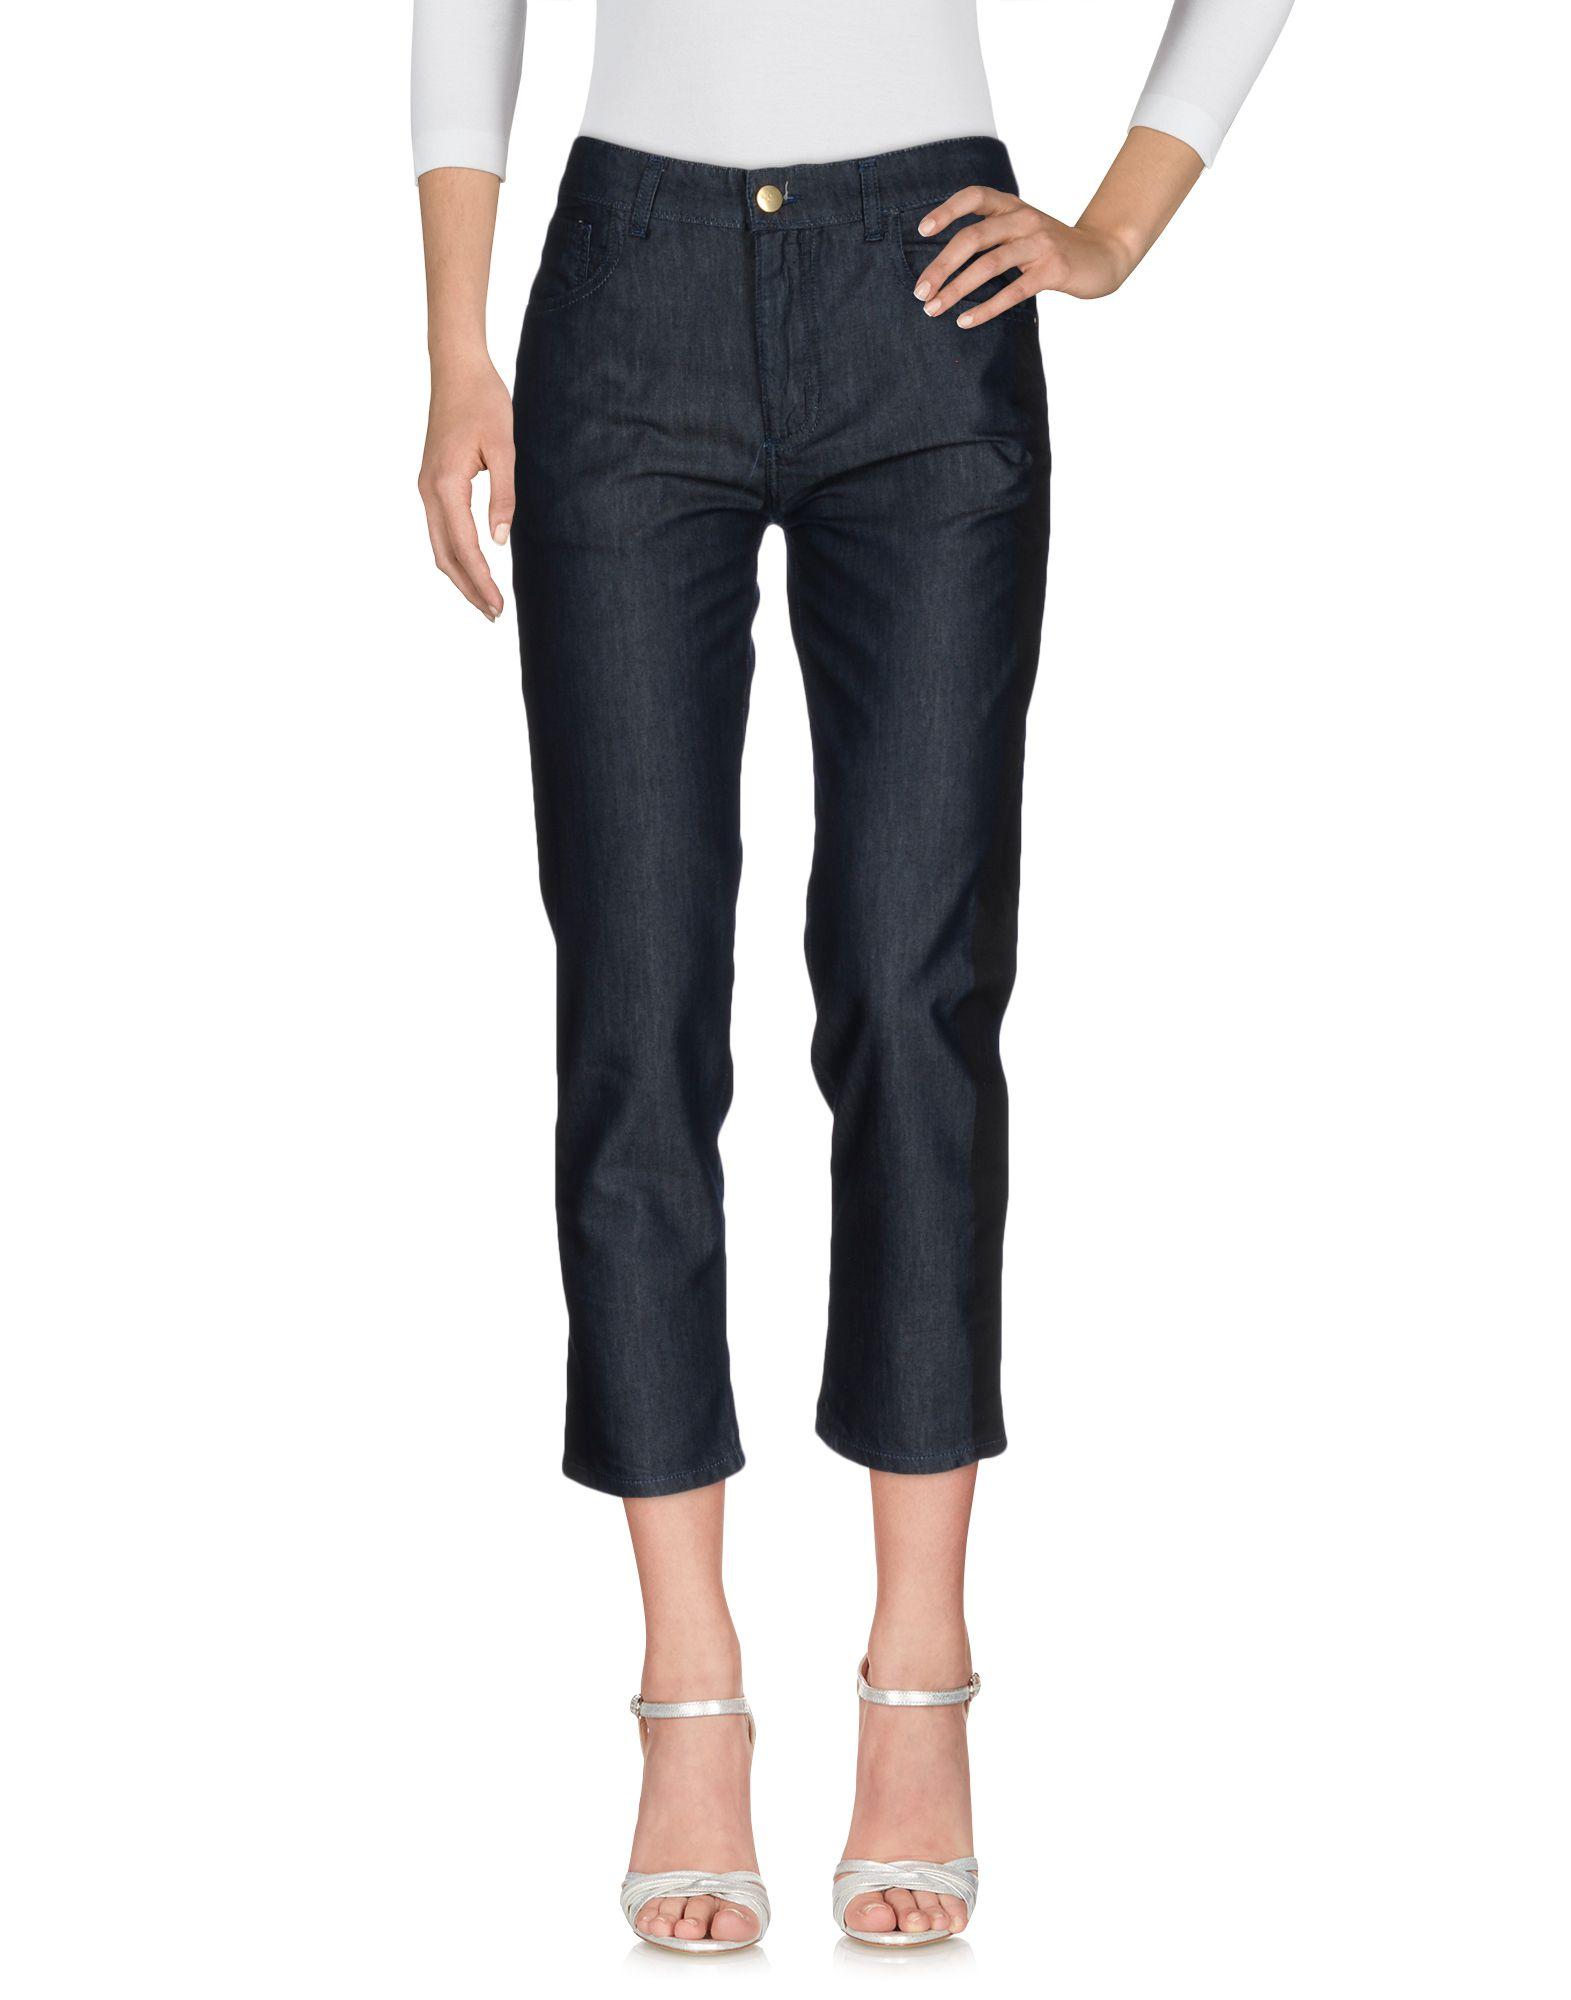 HI-TOUCH Jeans